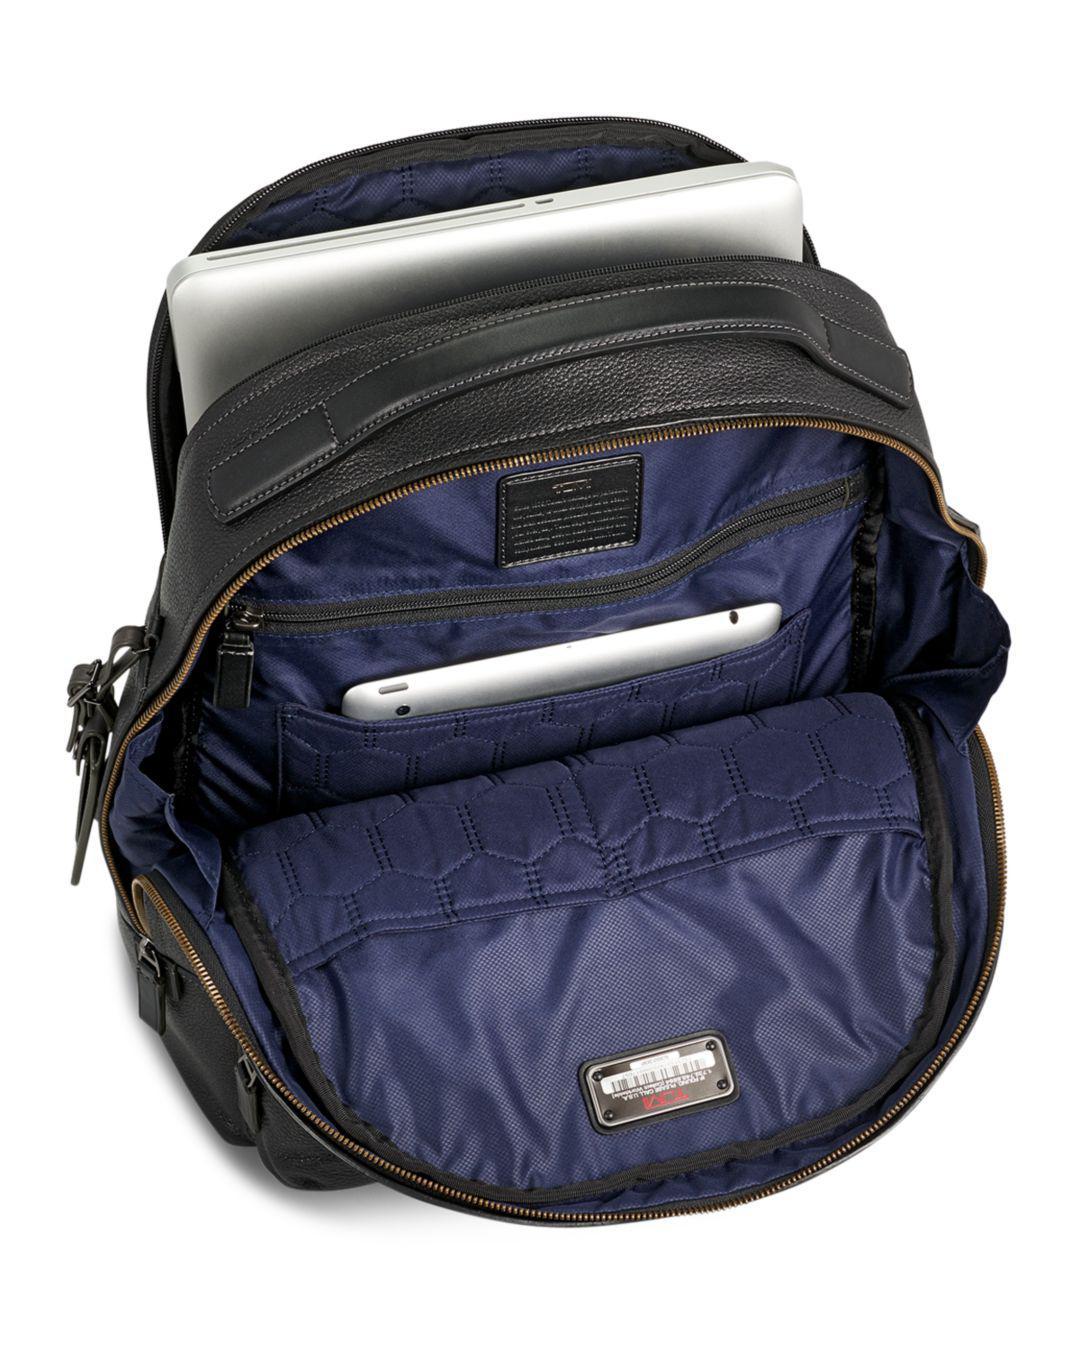 377e867ca5b5 Lyst - Tumi Harrison Leather Webster Backpack in Black for Men